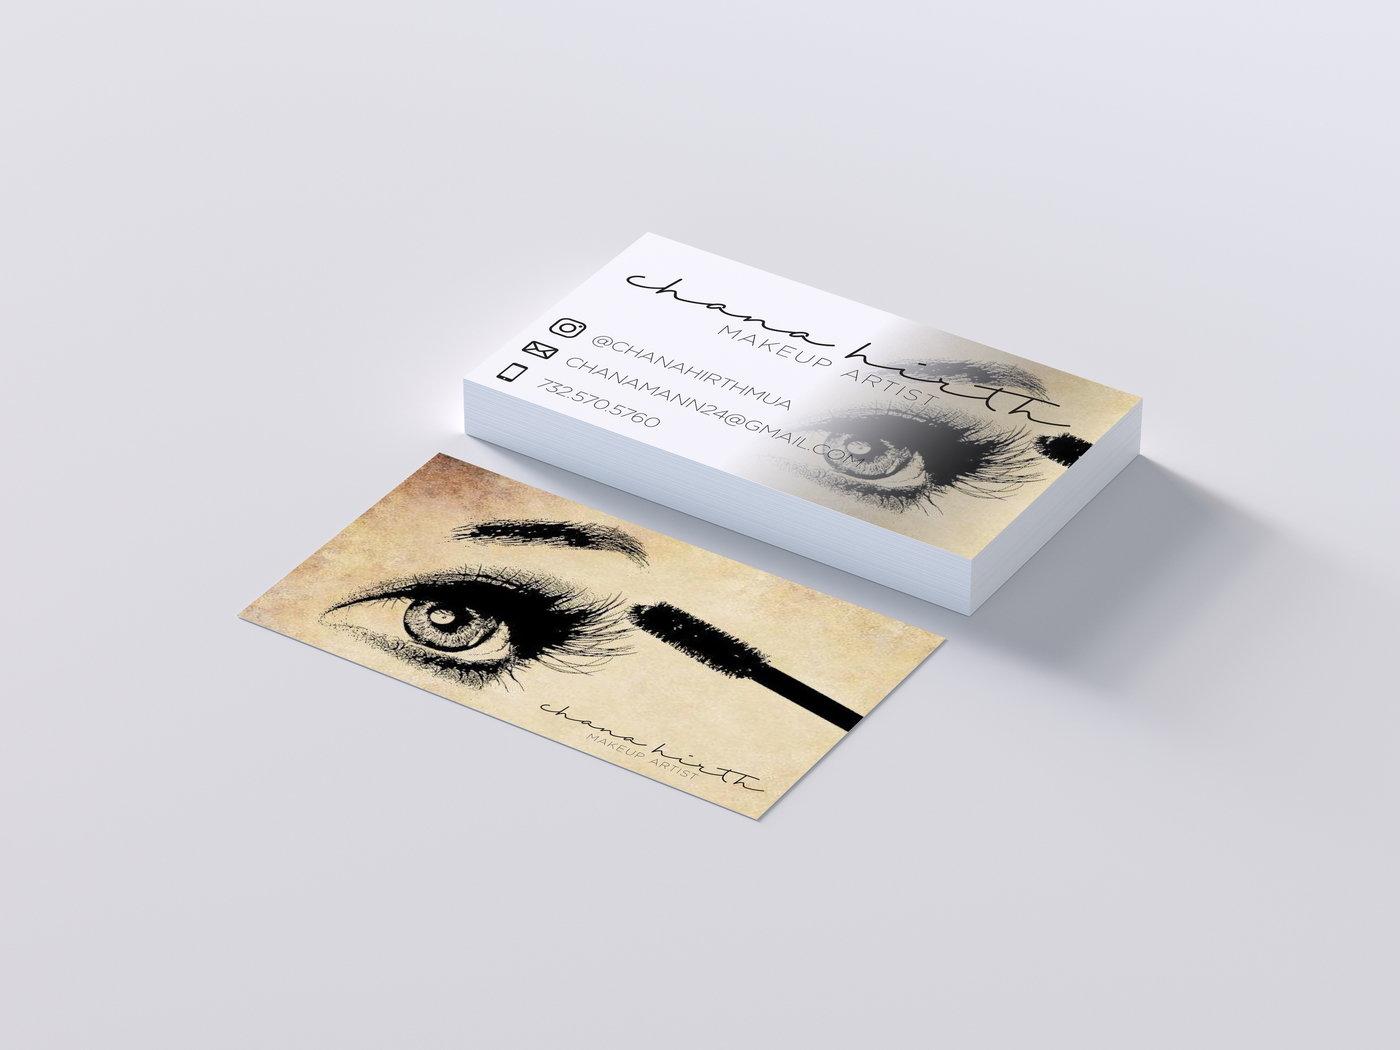 Chana Hirth MUA Business Card By Hudi Neuberger At Coroflot